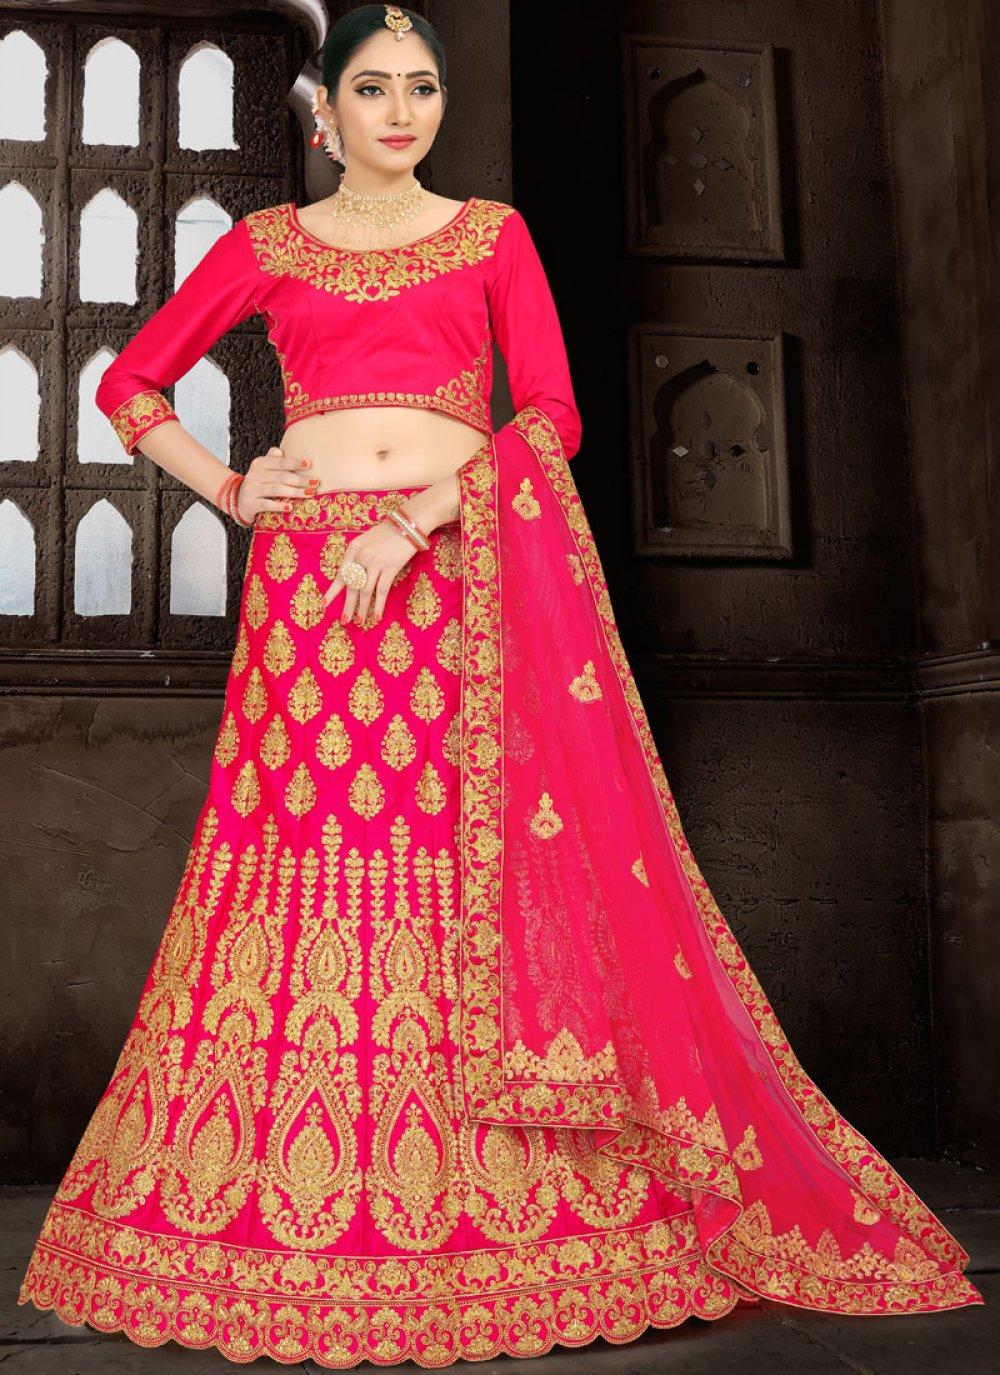 Hot Pink Zari Wedding Lehenga Choli